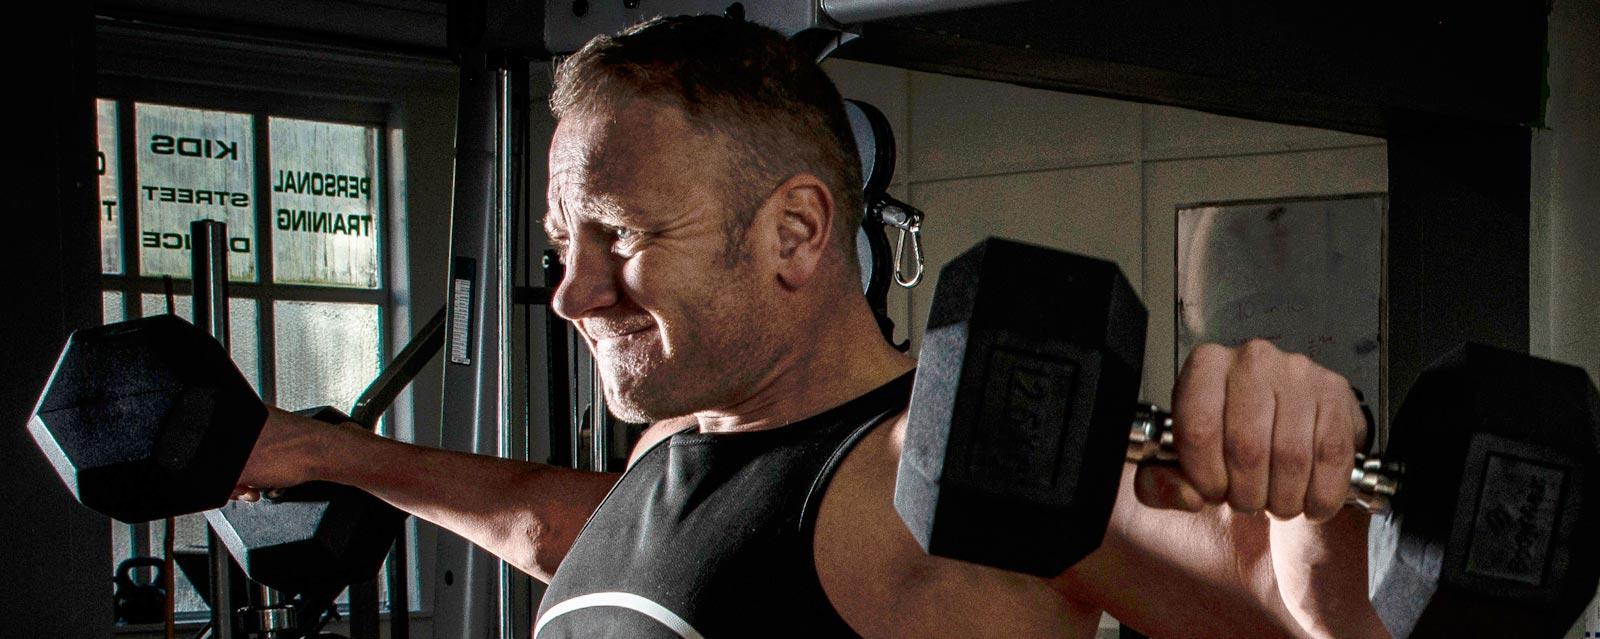 aspectos del fallo muscular